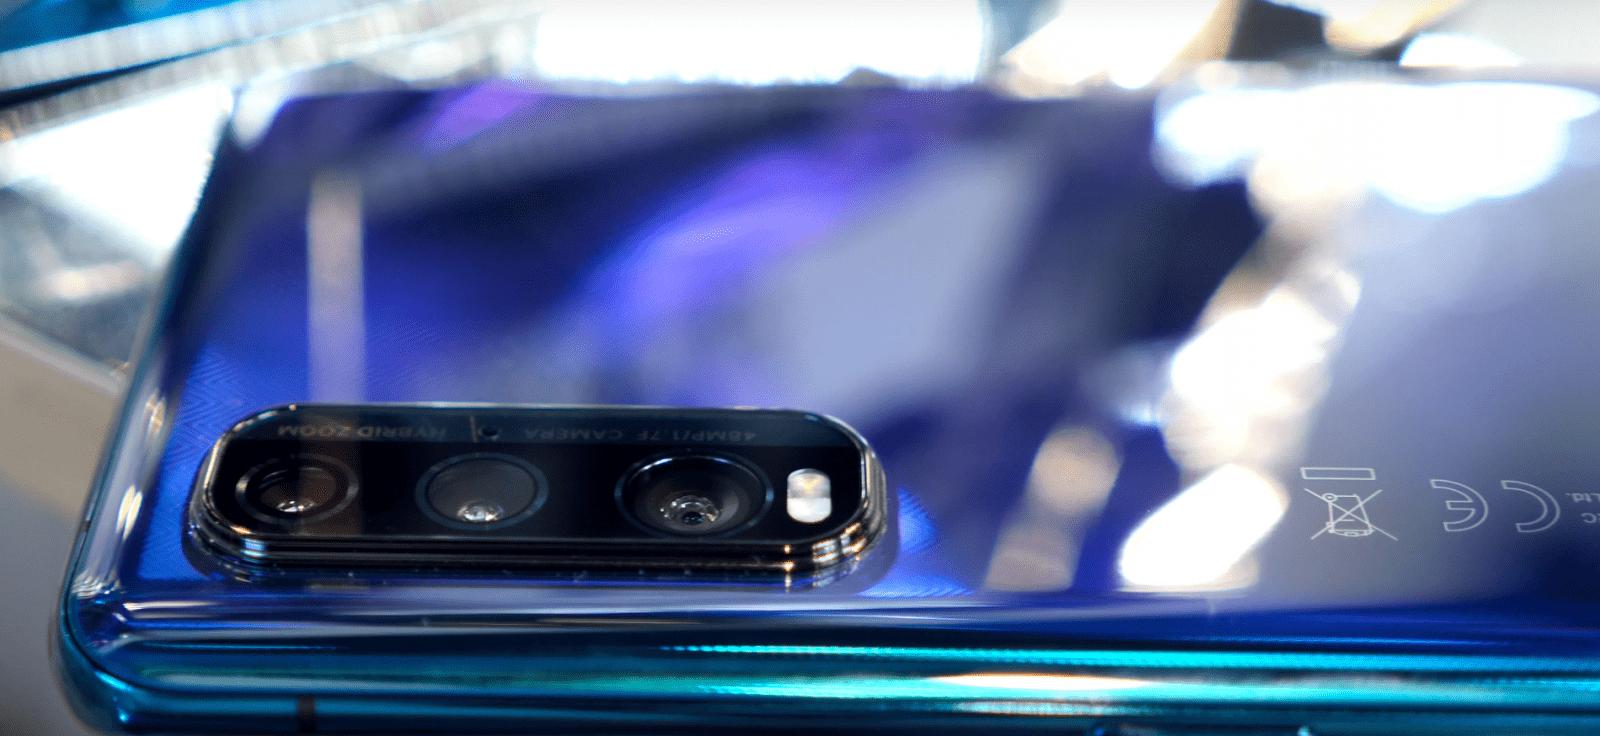 Oppo представил новый смартфон Find X2 (screenshot from 2020 03 06 15 30 42)